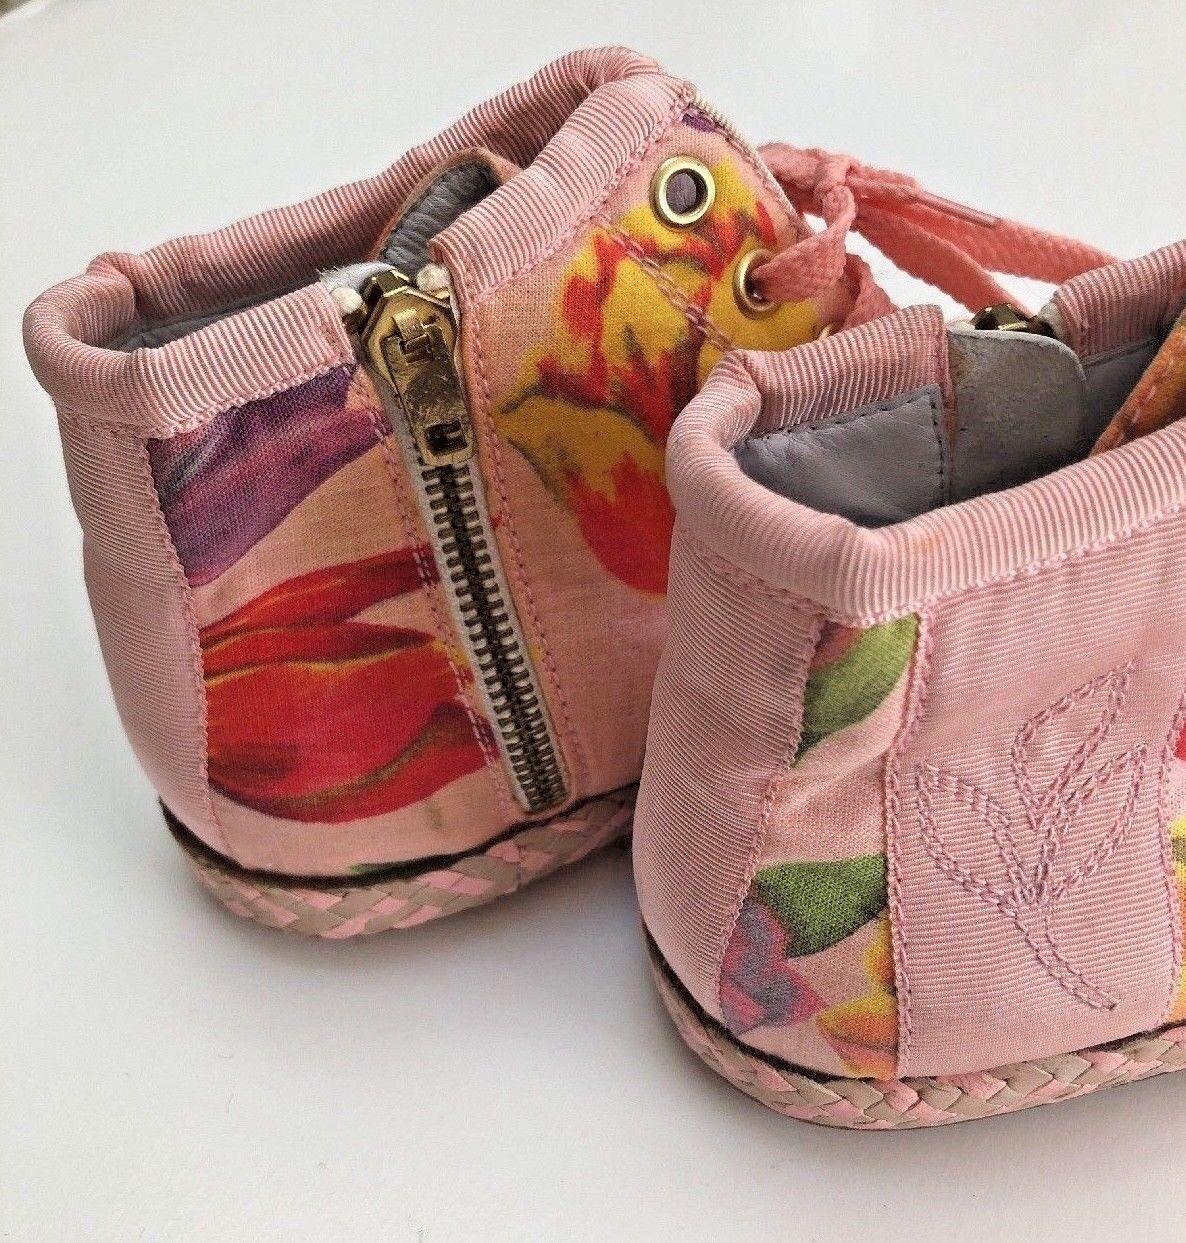 SUSAN BENNIS WARREN EDWARDS Vtg Espadrilles Sneakers 6.5 Pink Floral Italy 6.5 Sneakers $395 313b62